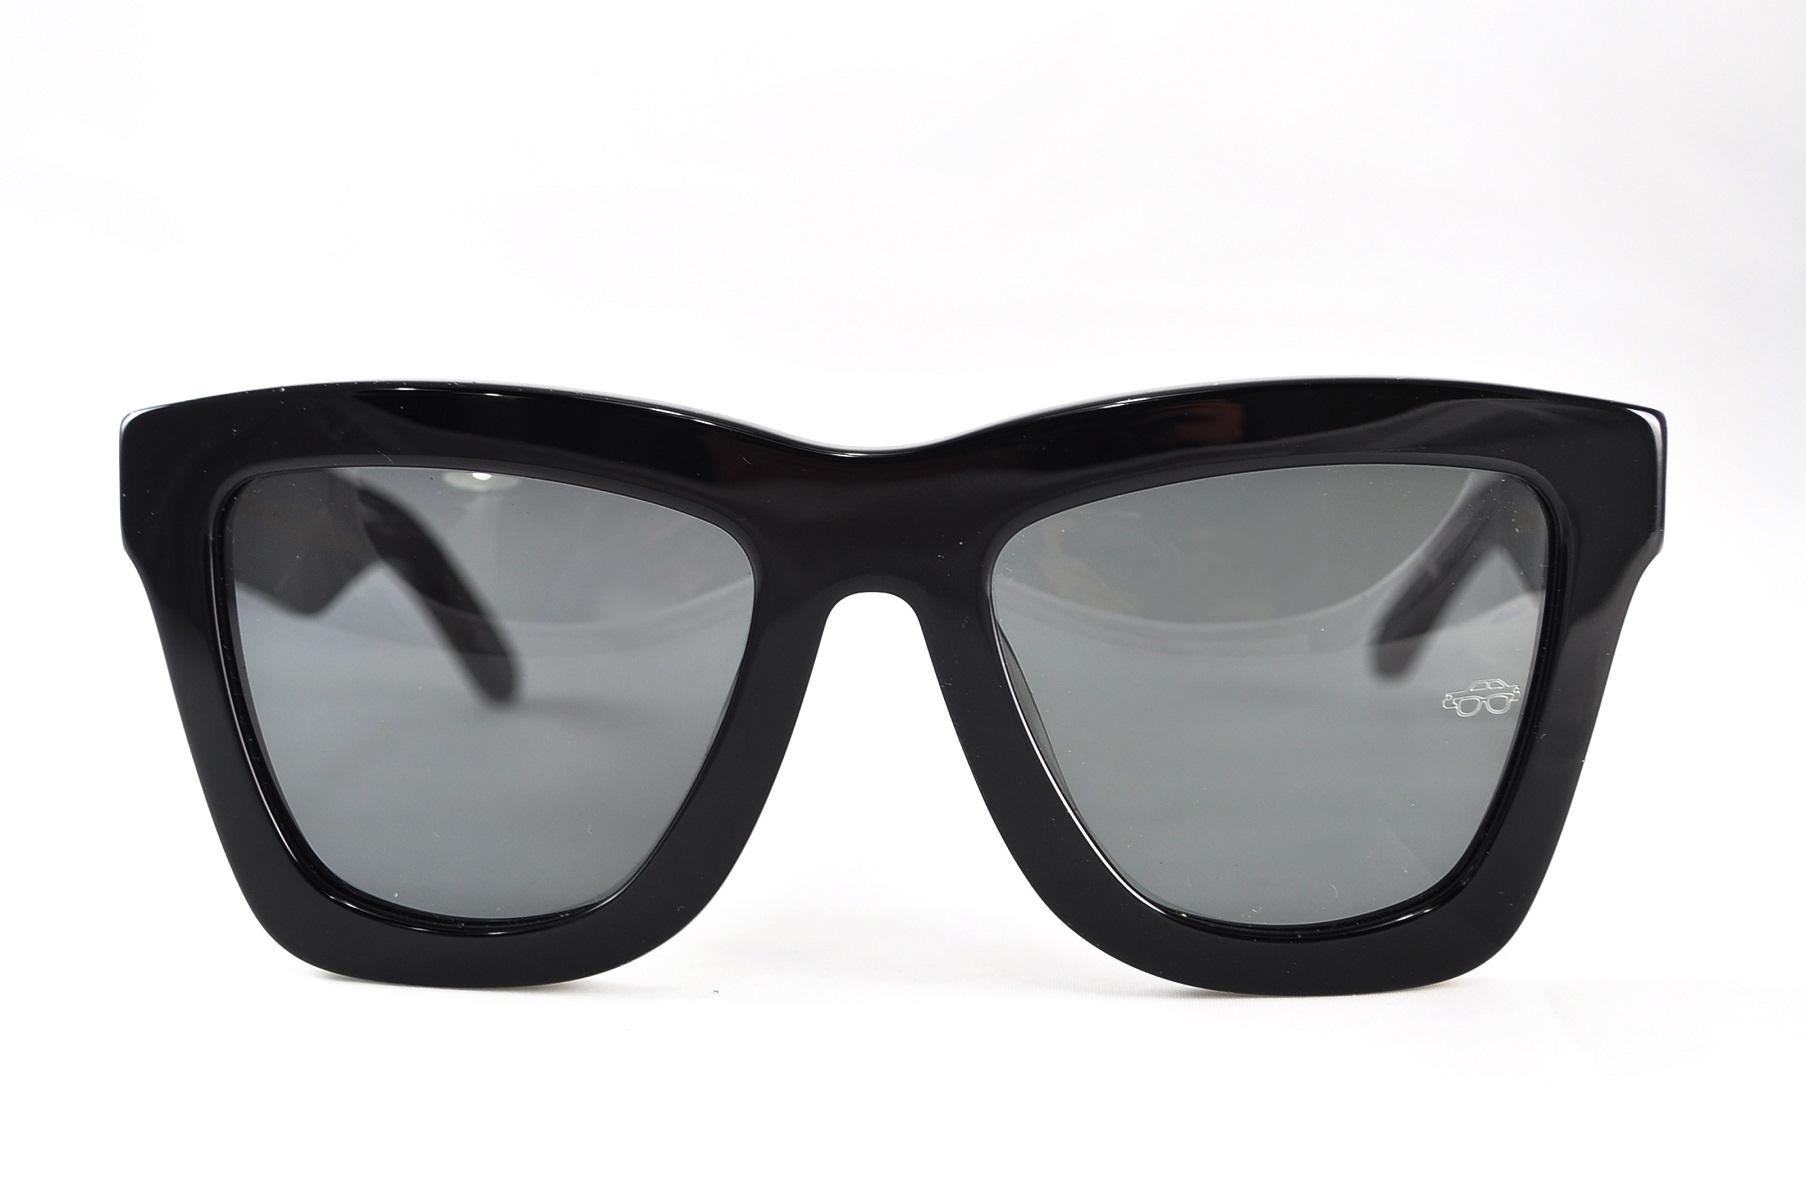 YOSHIMOTO ATTACT(黑) $6150